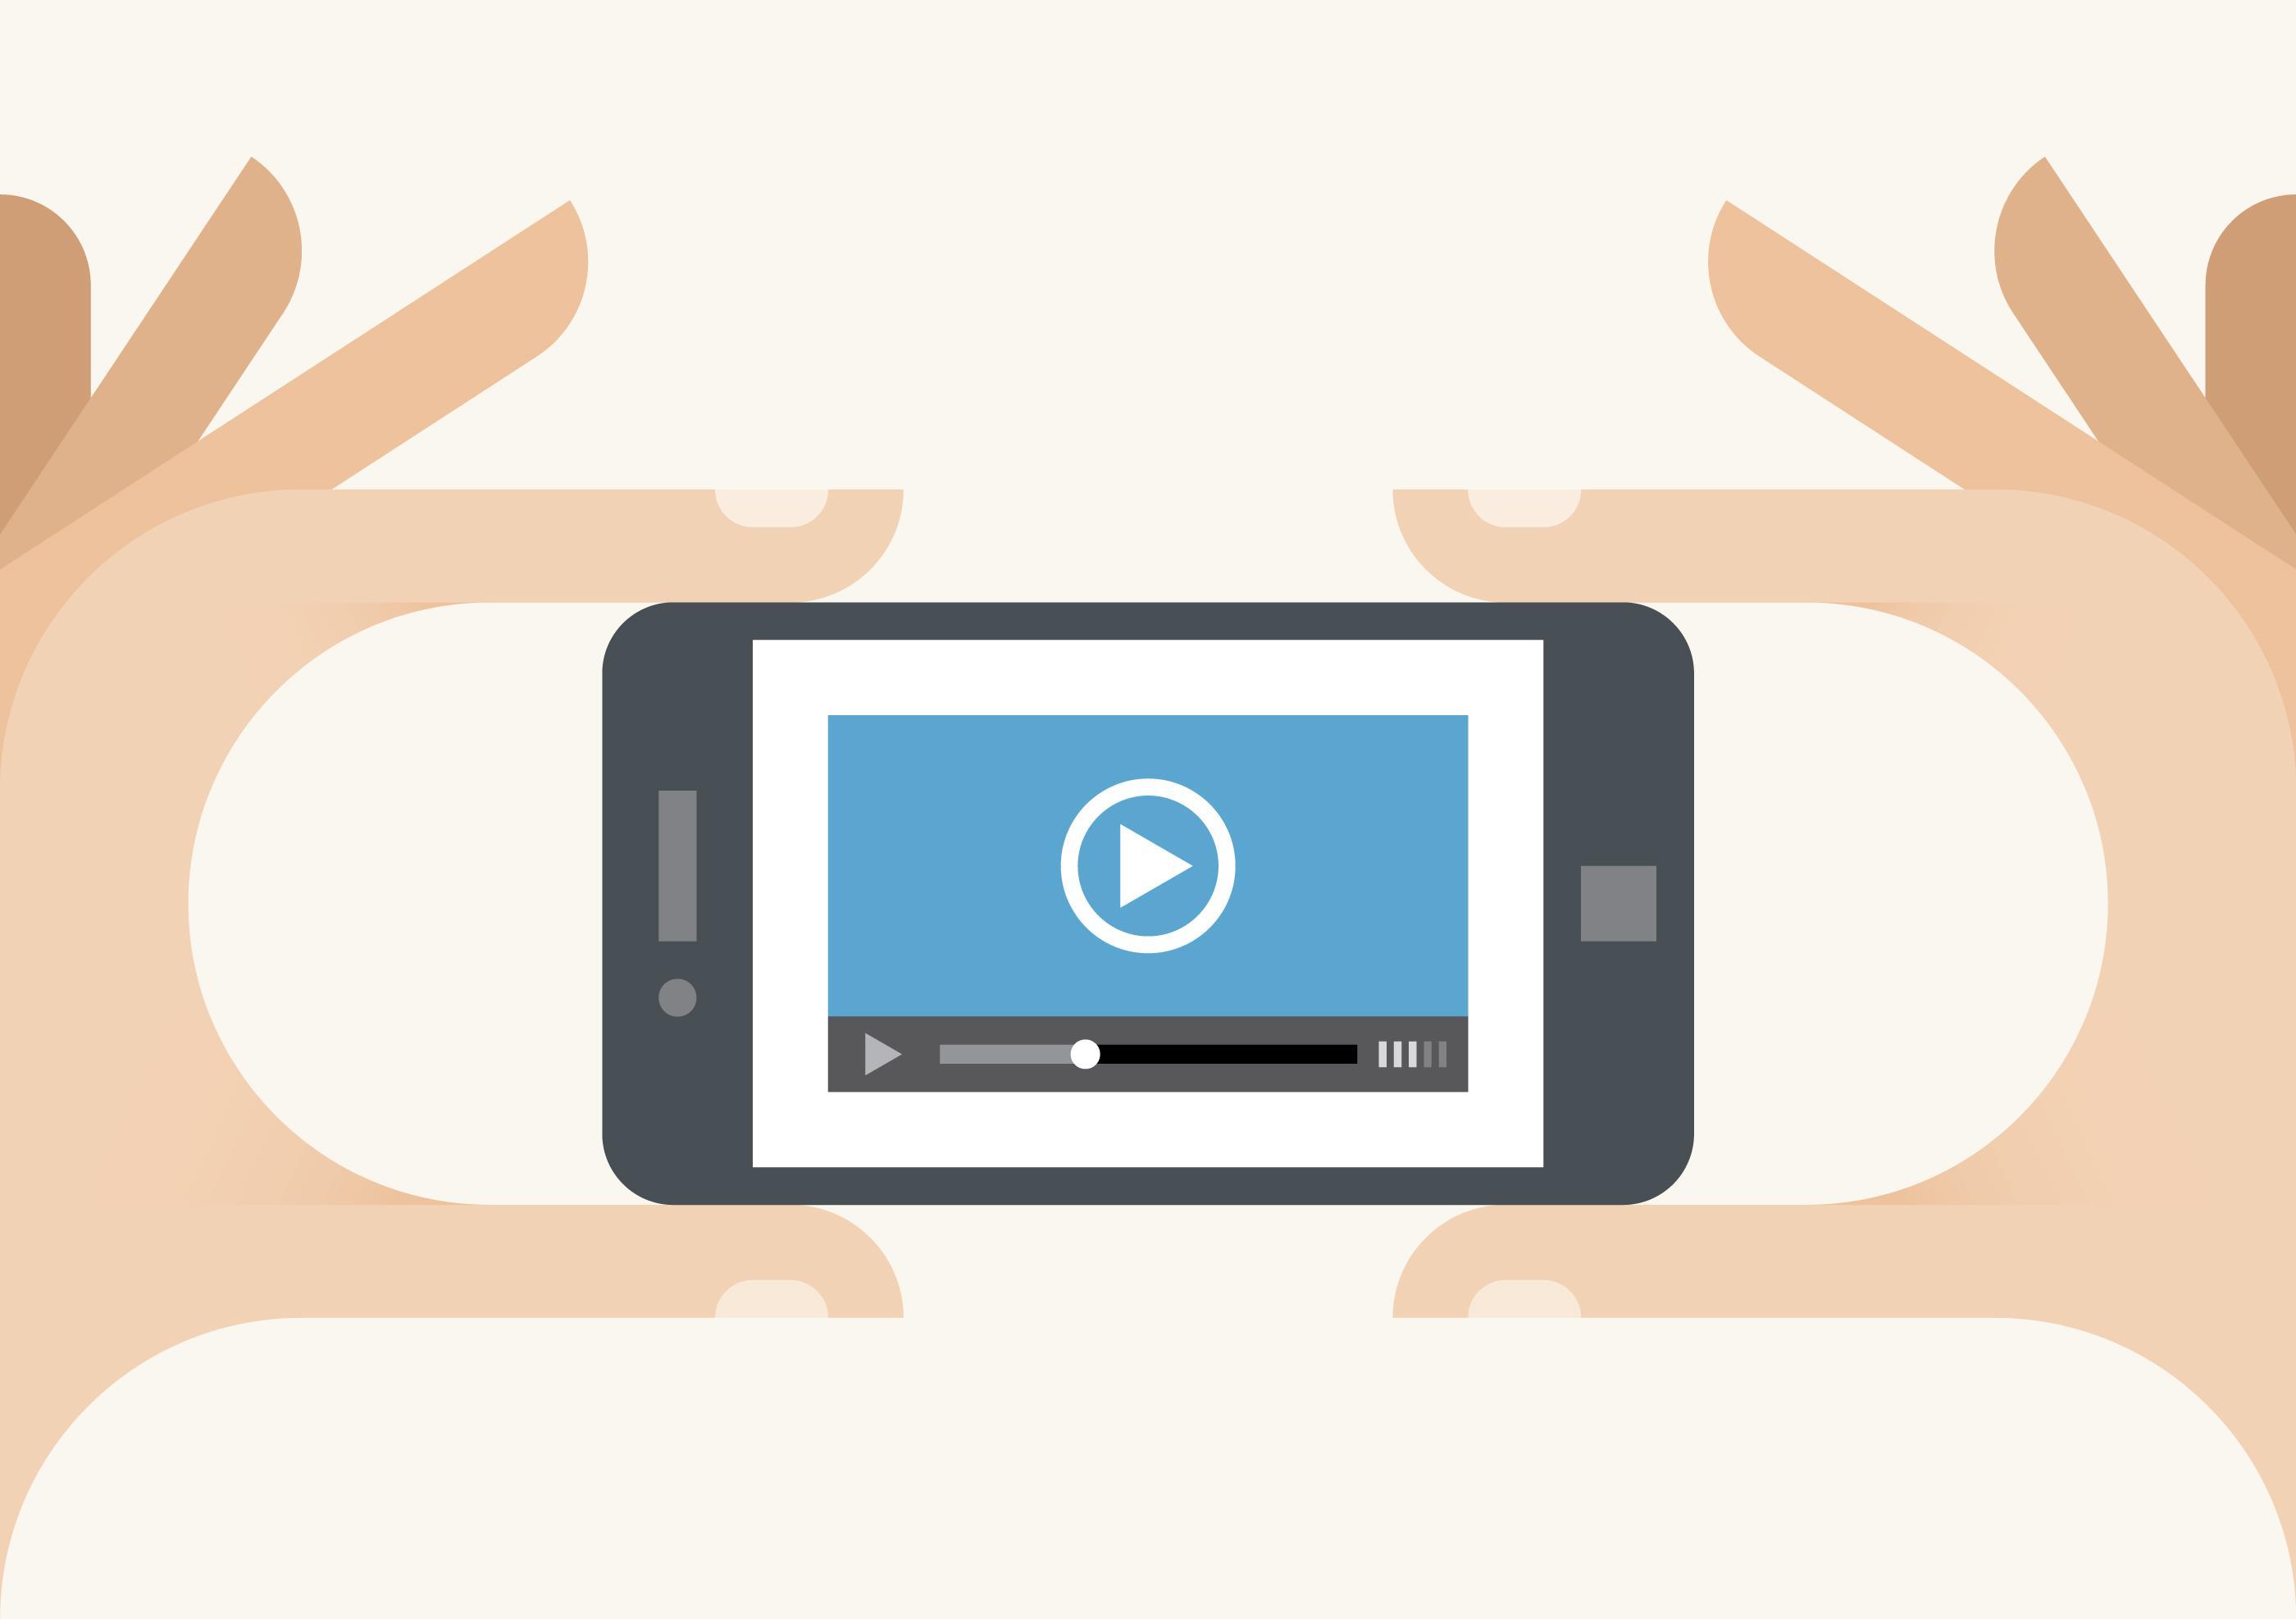 mobilnoe-video-onlayn